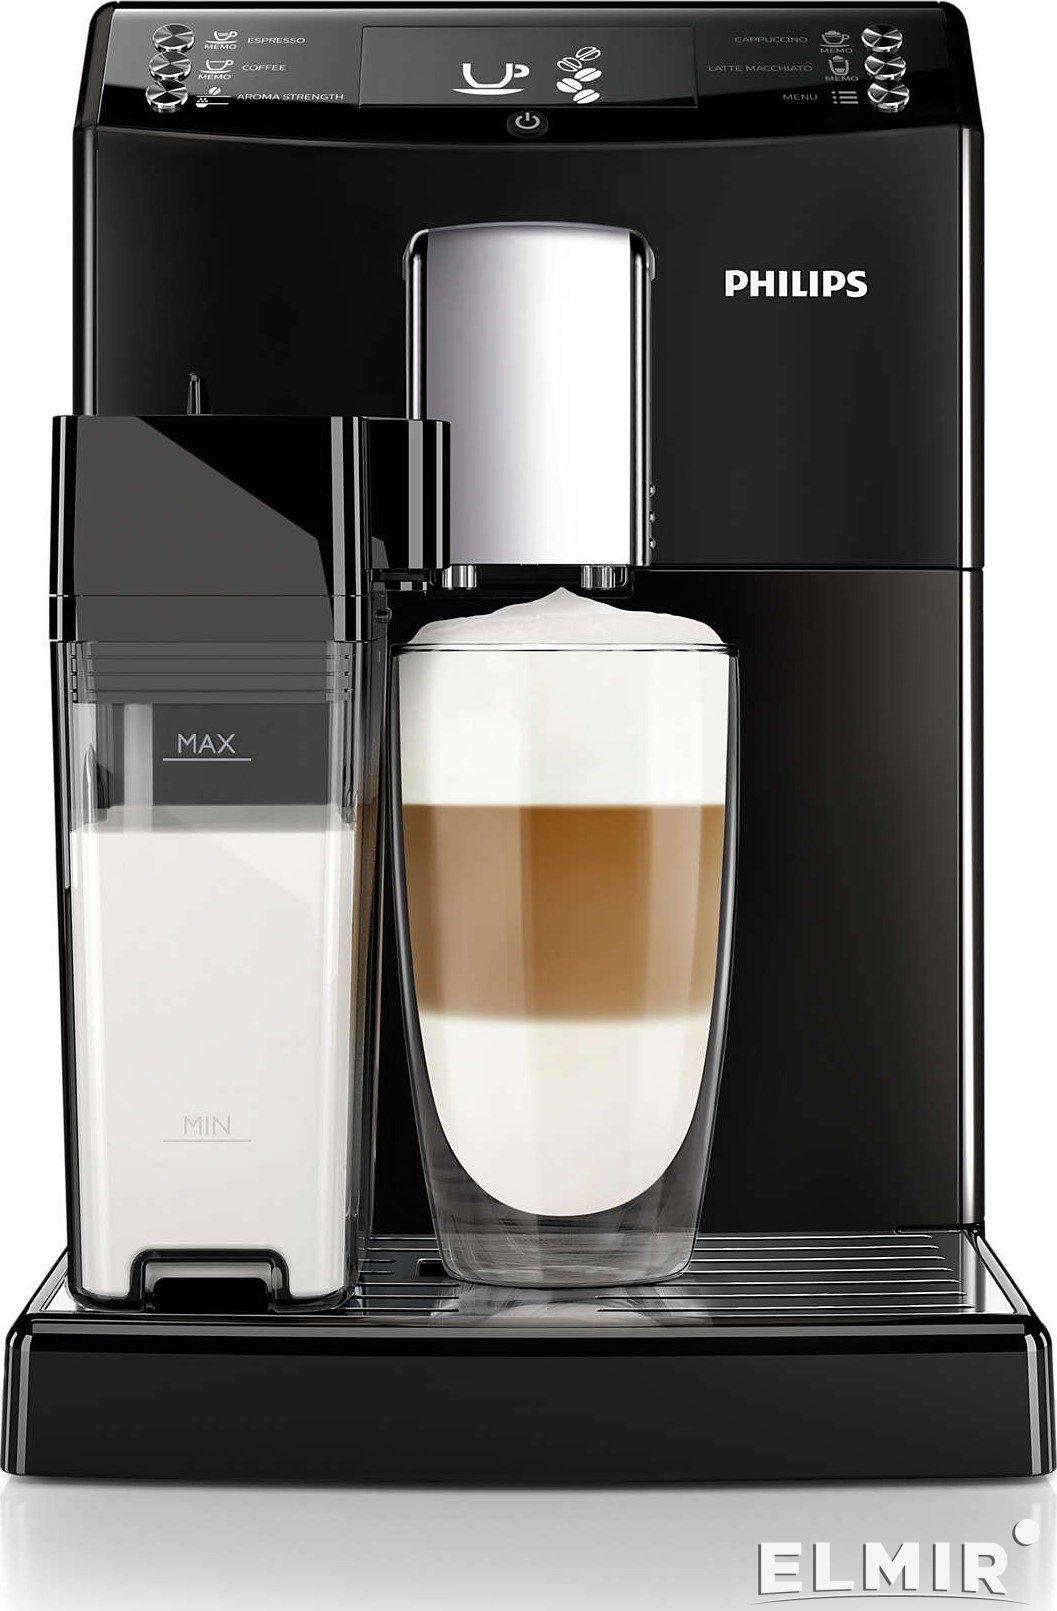 кофемашина Philips Ep3559 00 купить